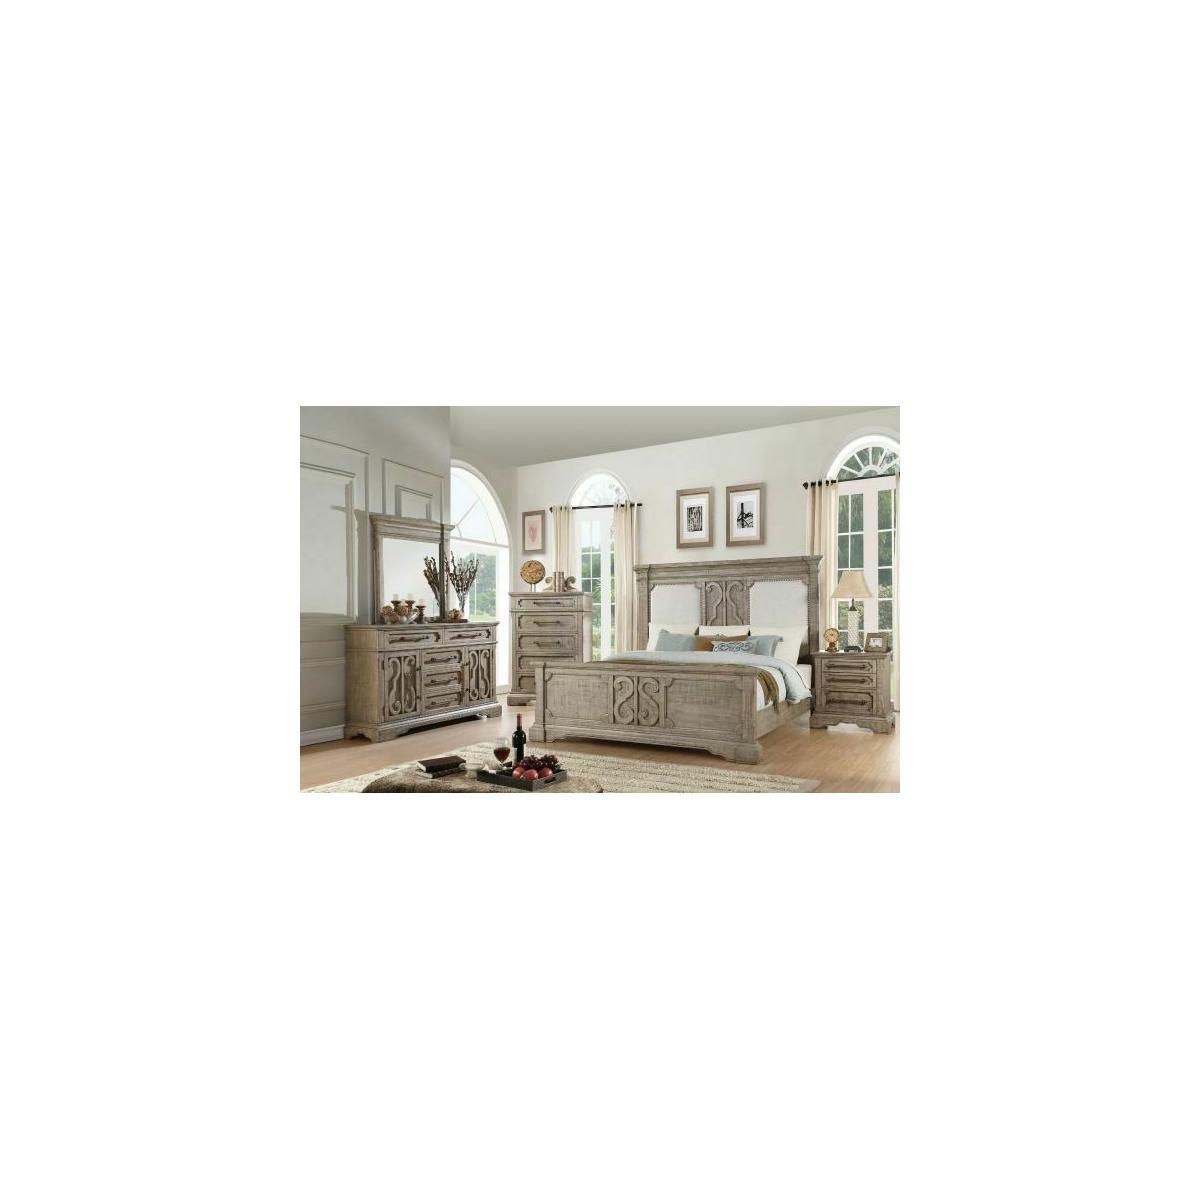 ACME Artesia Queen Bed - 27090Q - Tan Fabric & Salvaged Natural